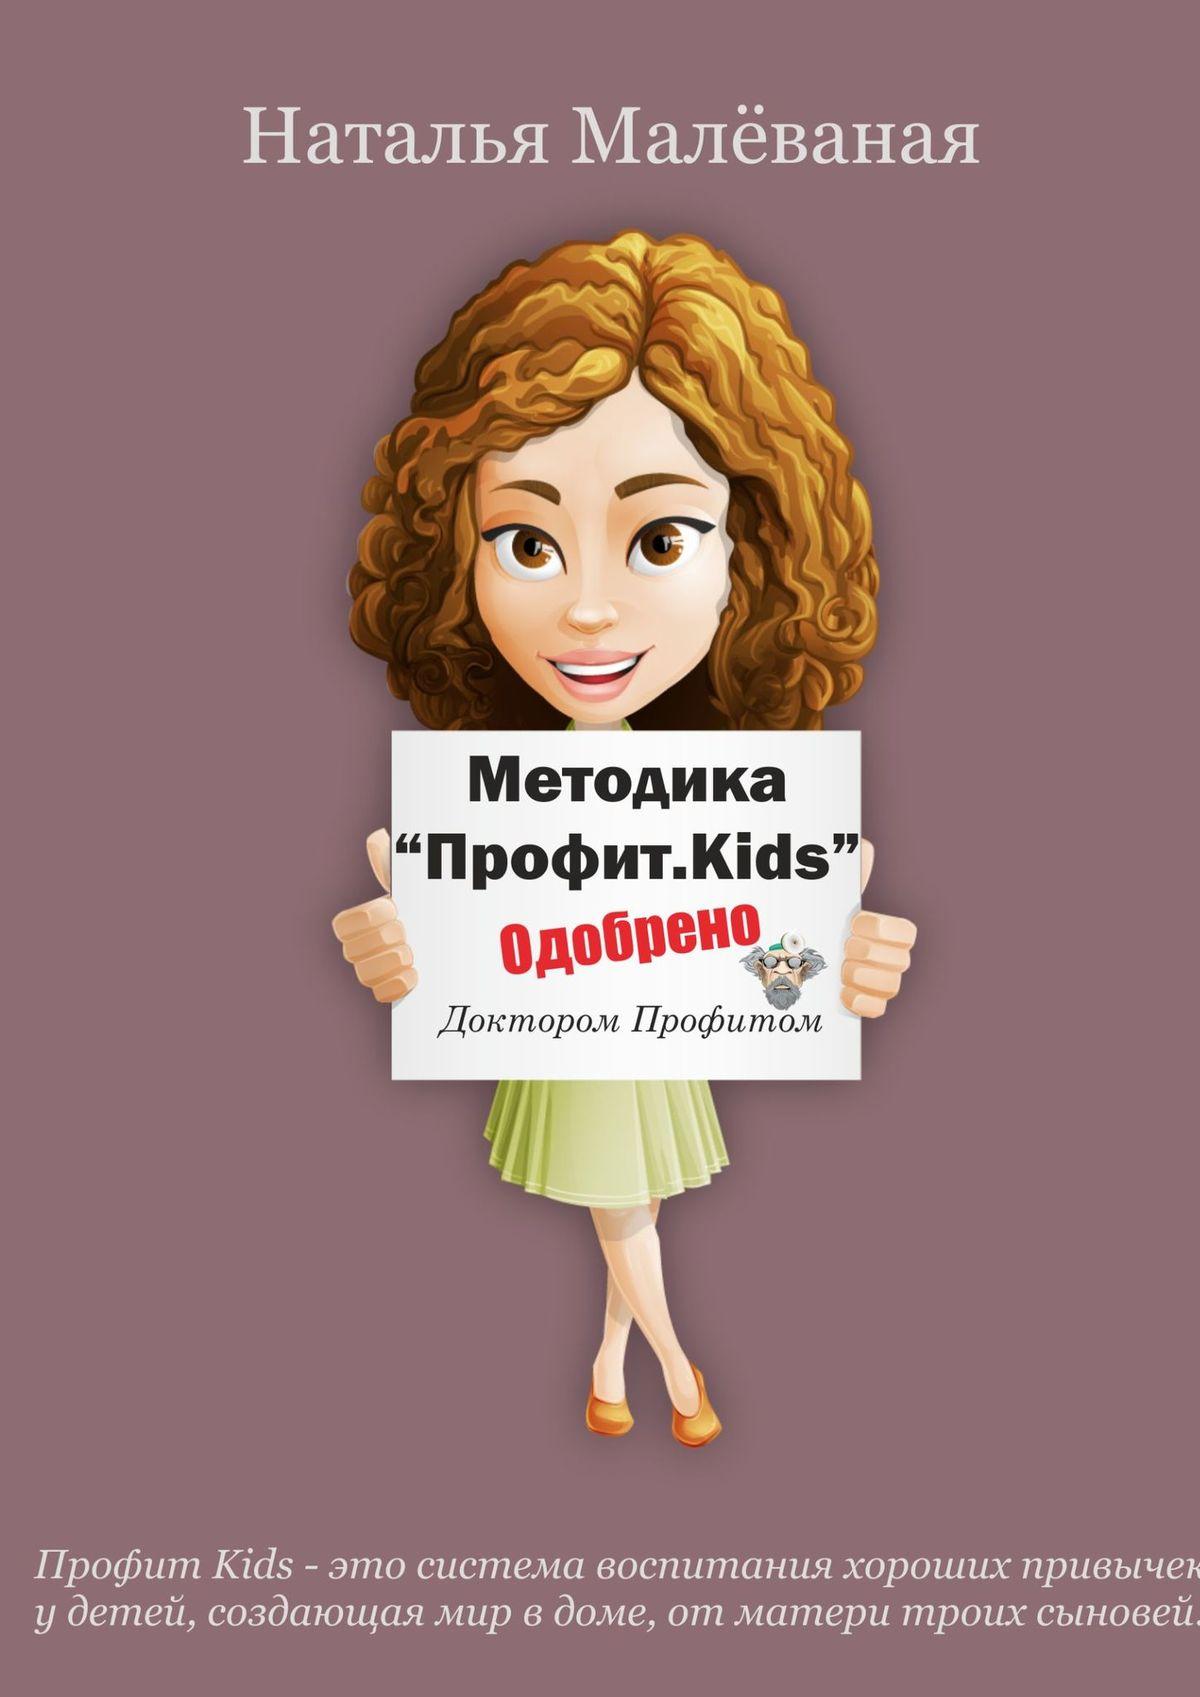 Наталья Малеваная Методика: ПрофитKids цена 2017